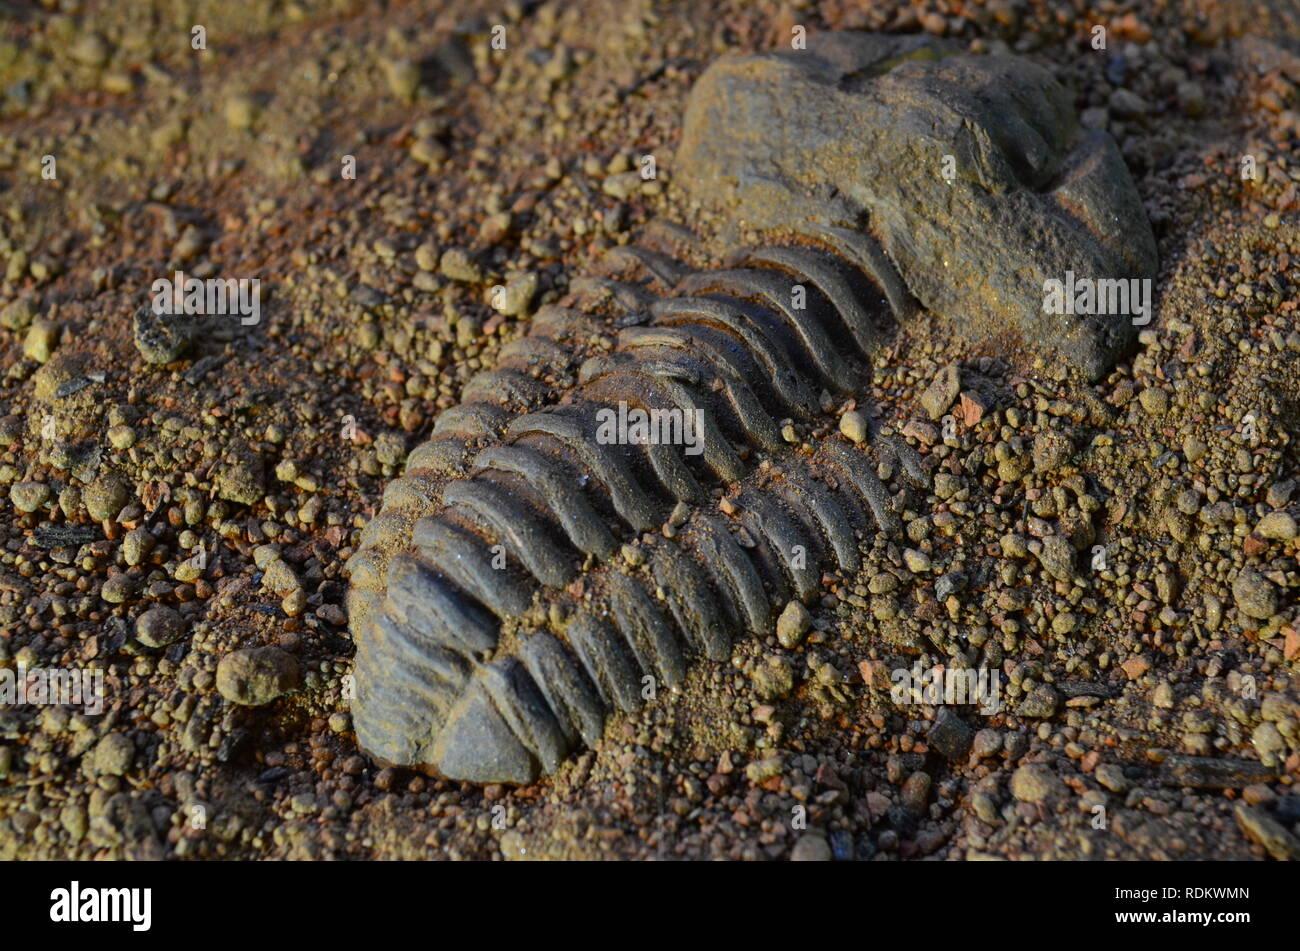 Trilobite Fossil 4 - Stock Image